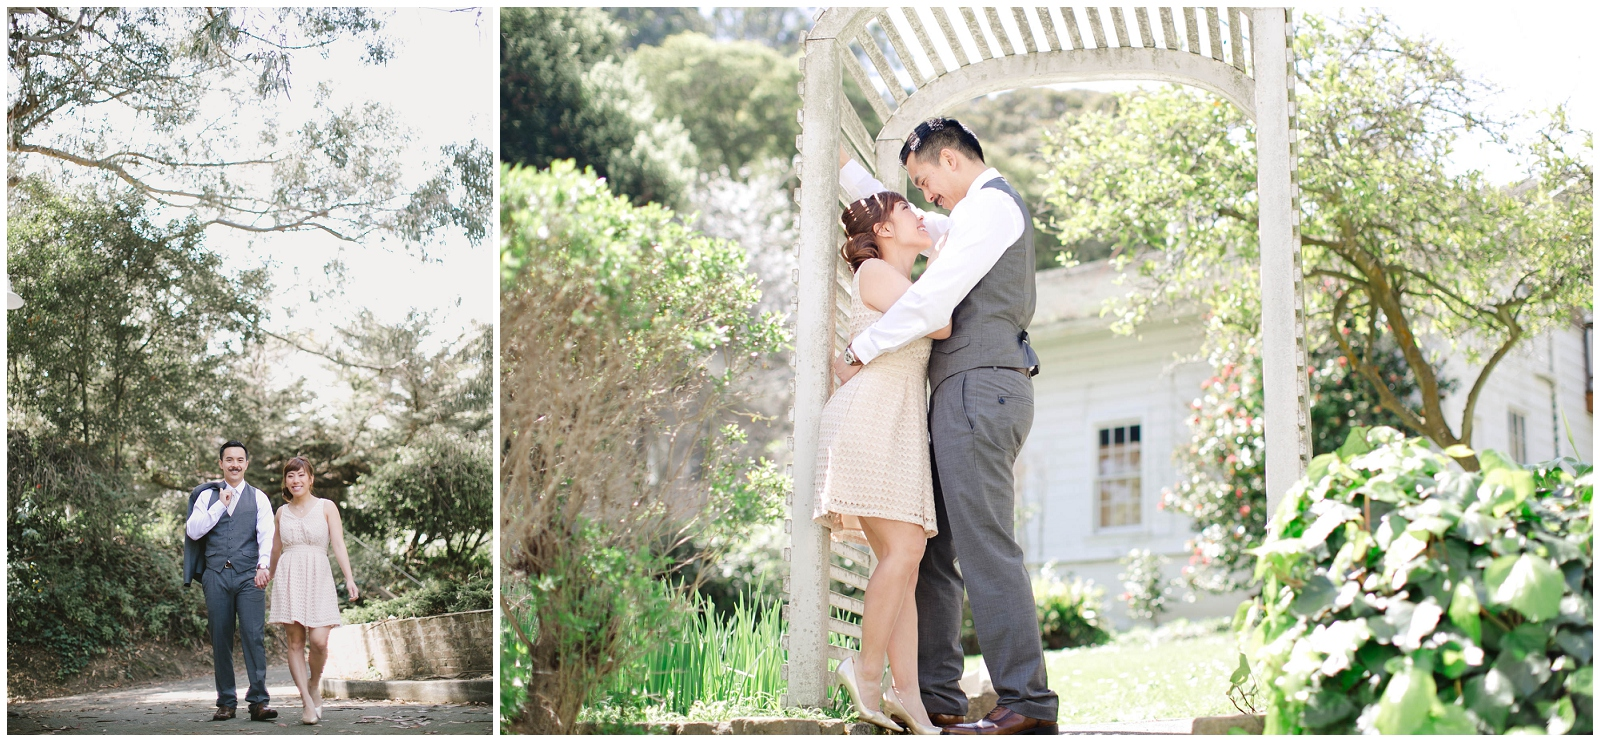 San-Francisco-Bay-Area-Wedding-Photography-Engagement-Treasure-Island-8.jpg